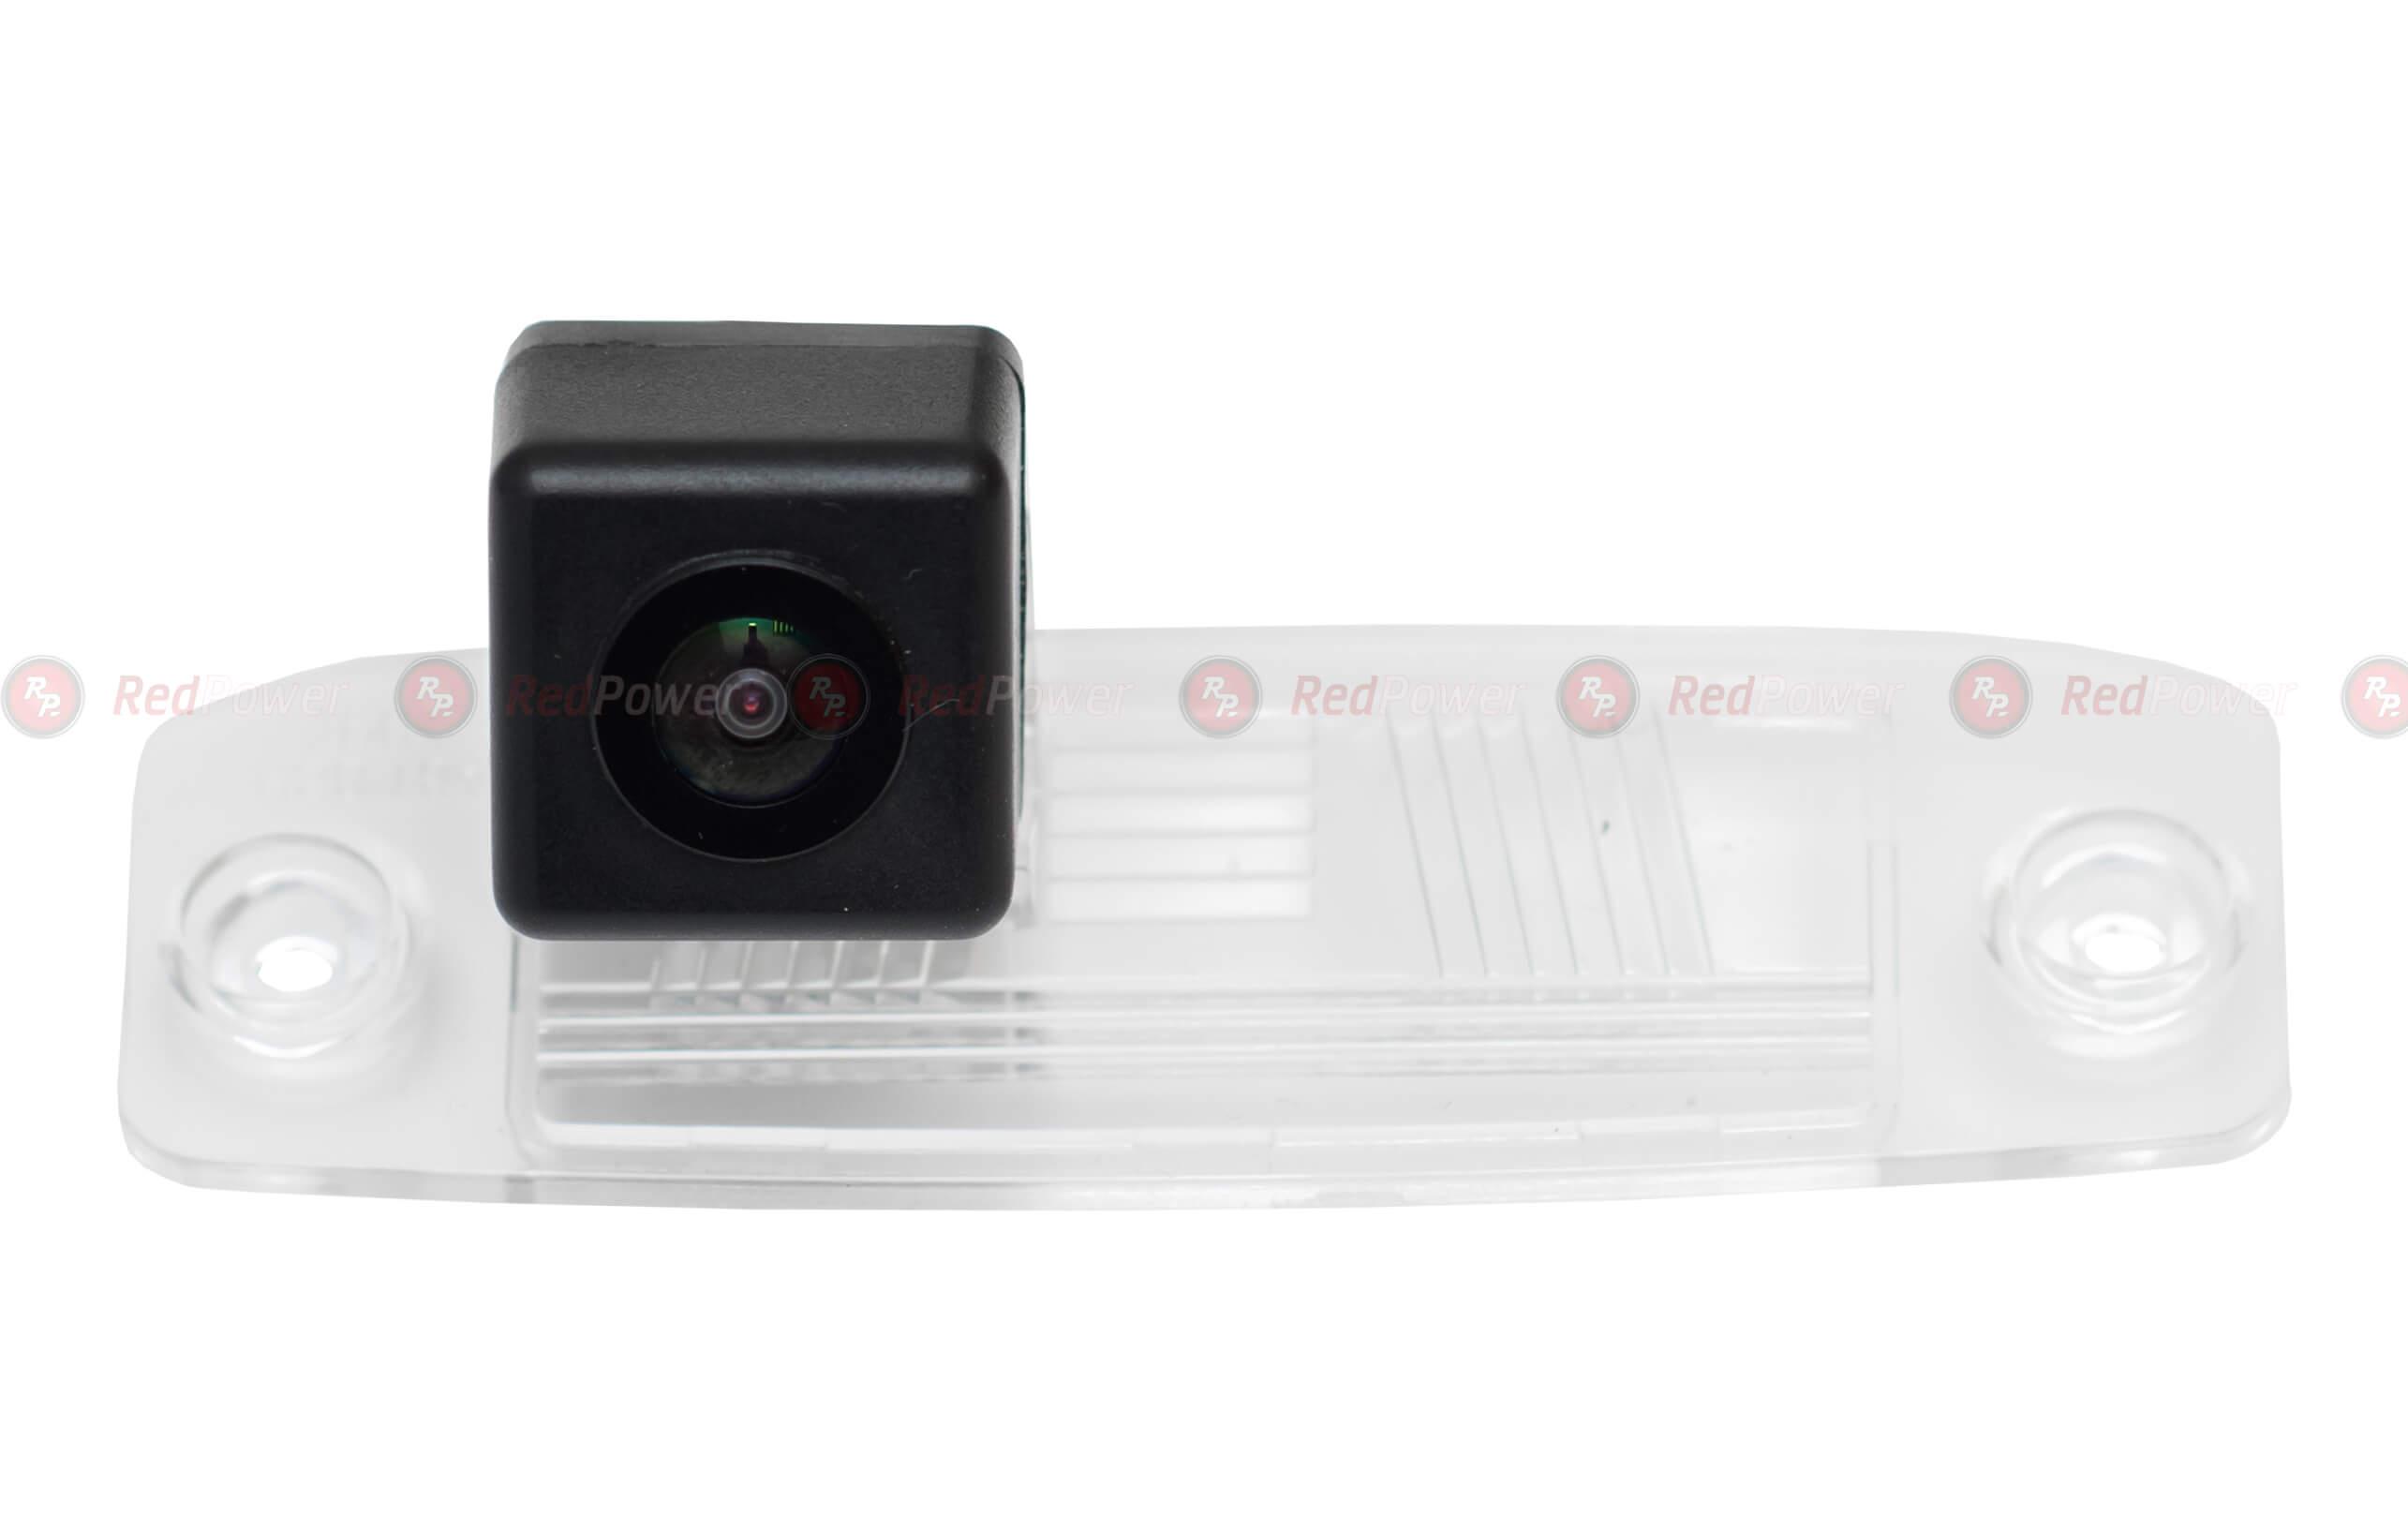 Штатная видеокамера парковки Redpower KIA090P Premium для KIA Sportage R, Sorento, Carens, Opirus штатная видеокамера парковки redpower fod059p premium для ford mondeo transit